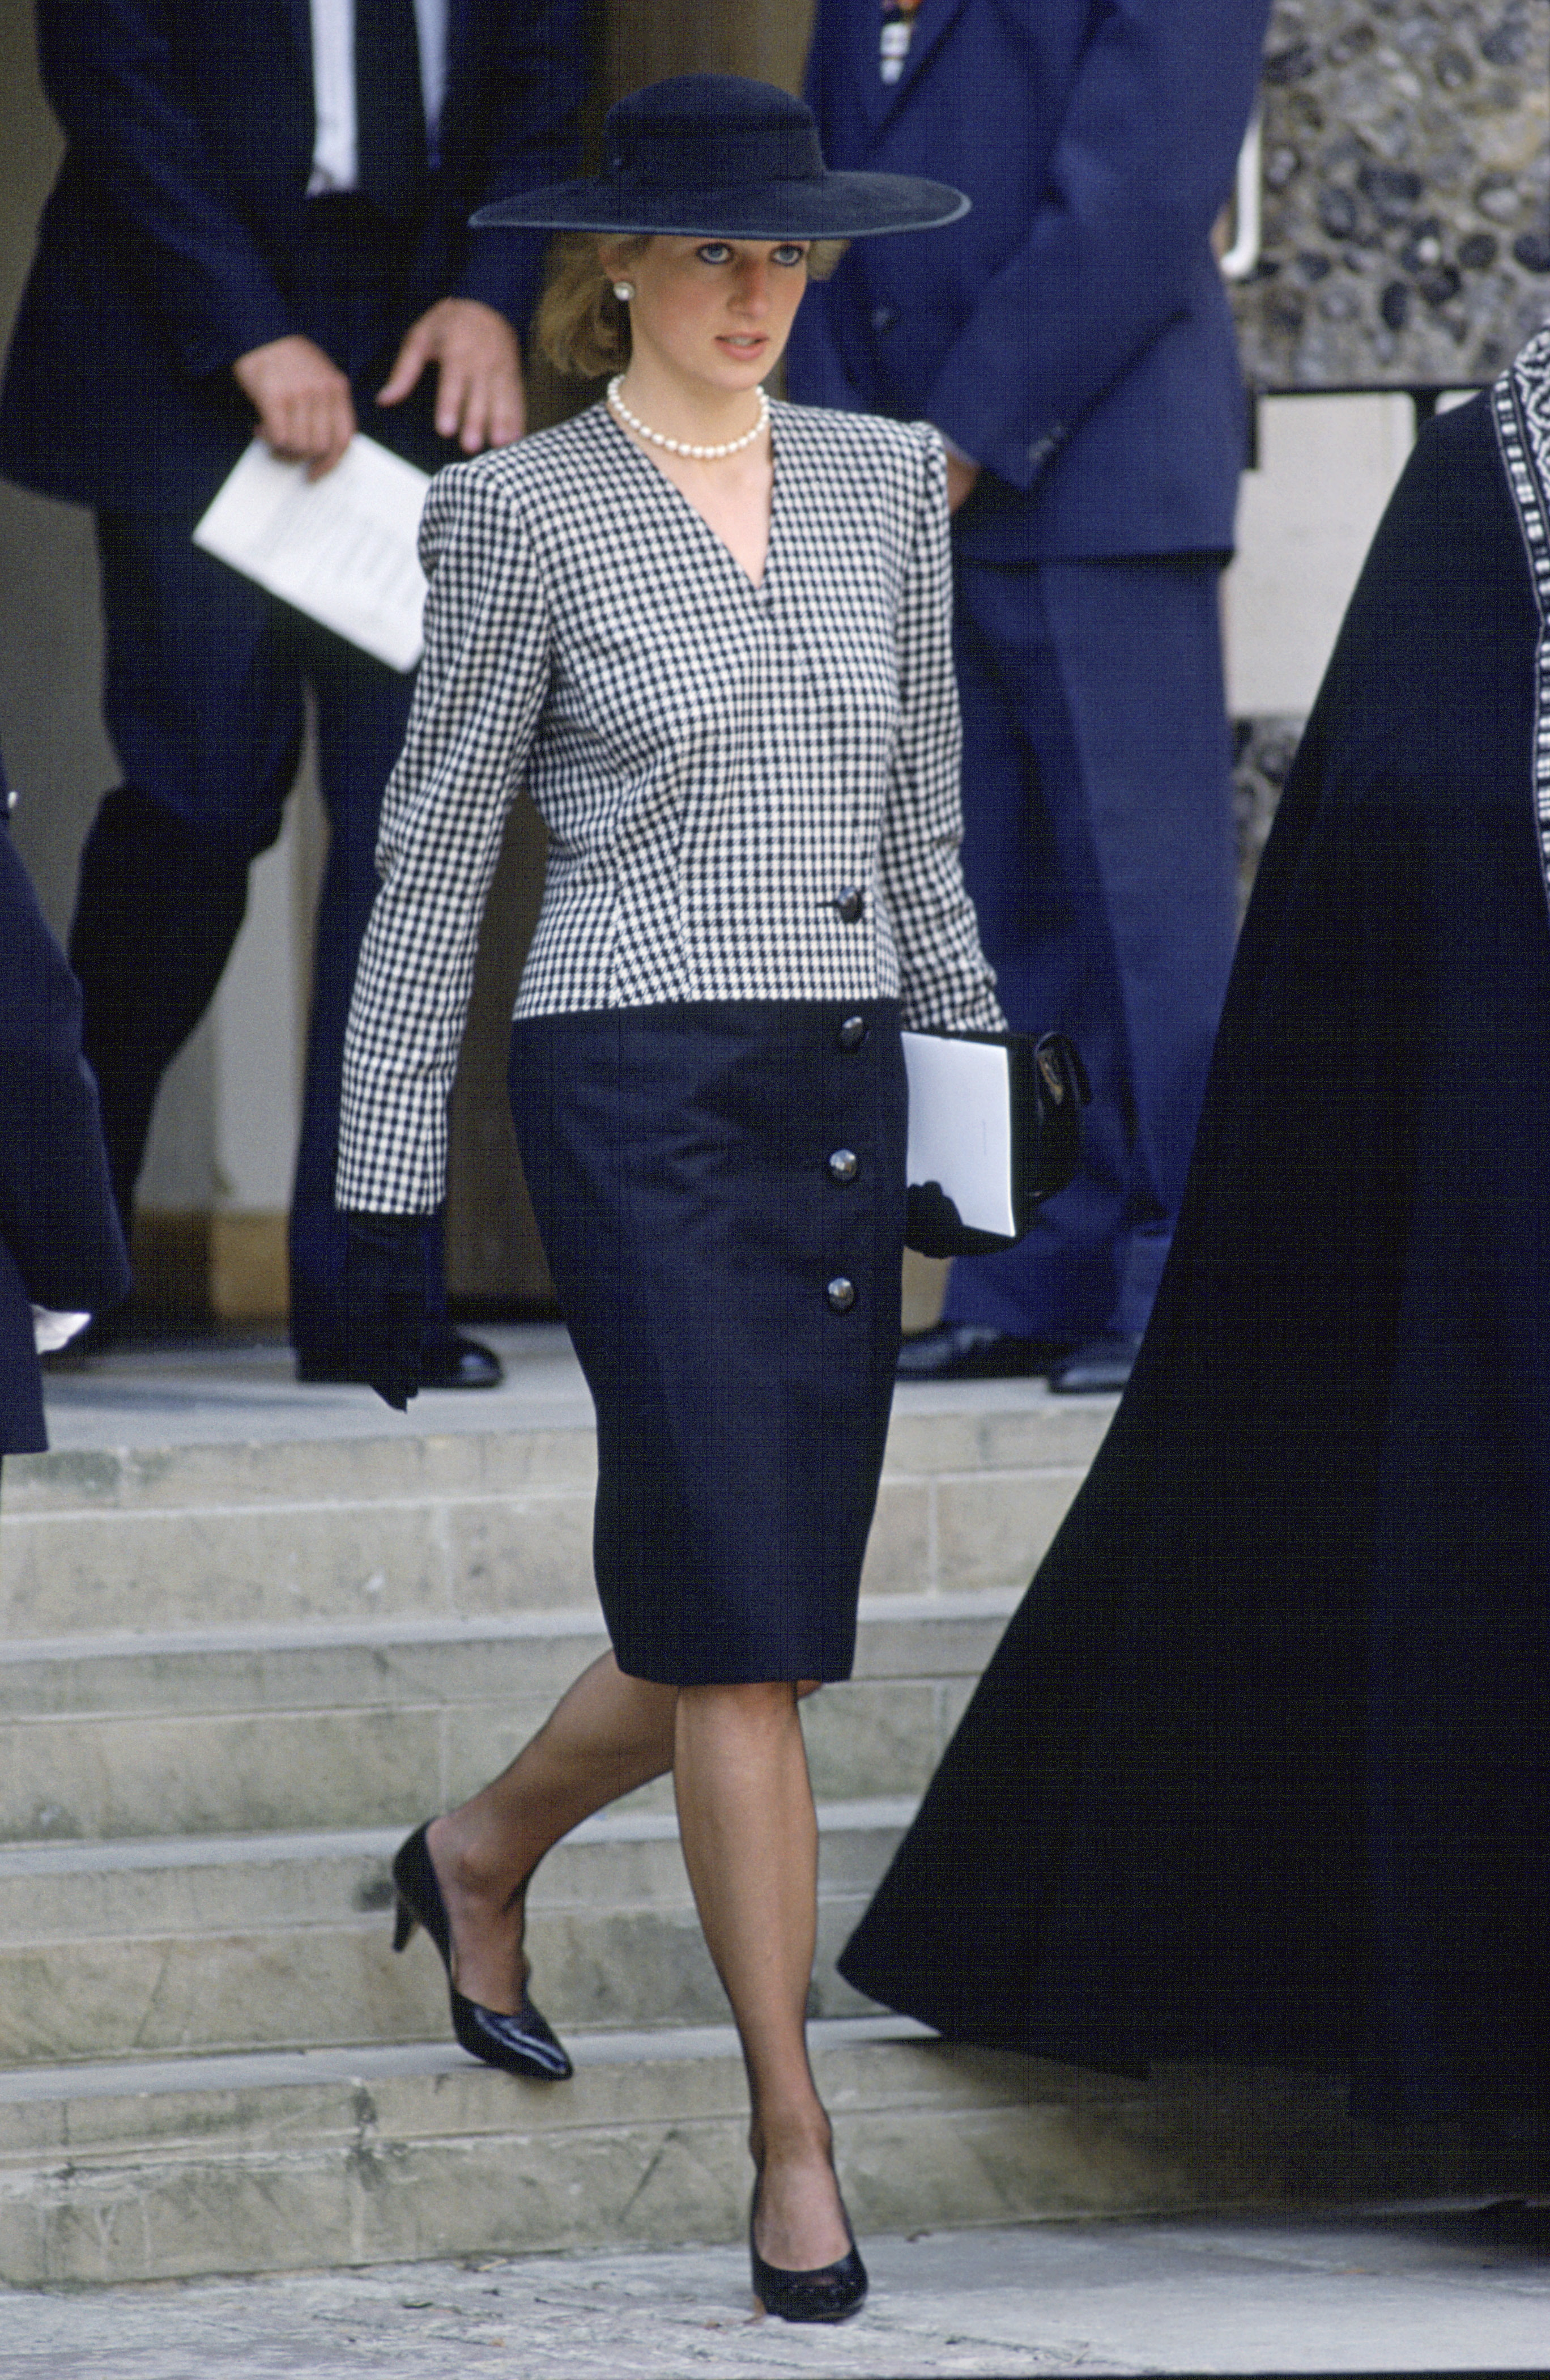 Princess Diana S Most Iconic Fashion Moments